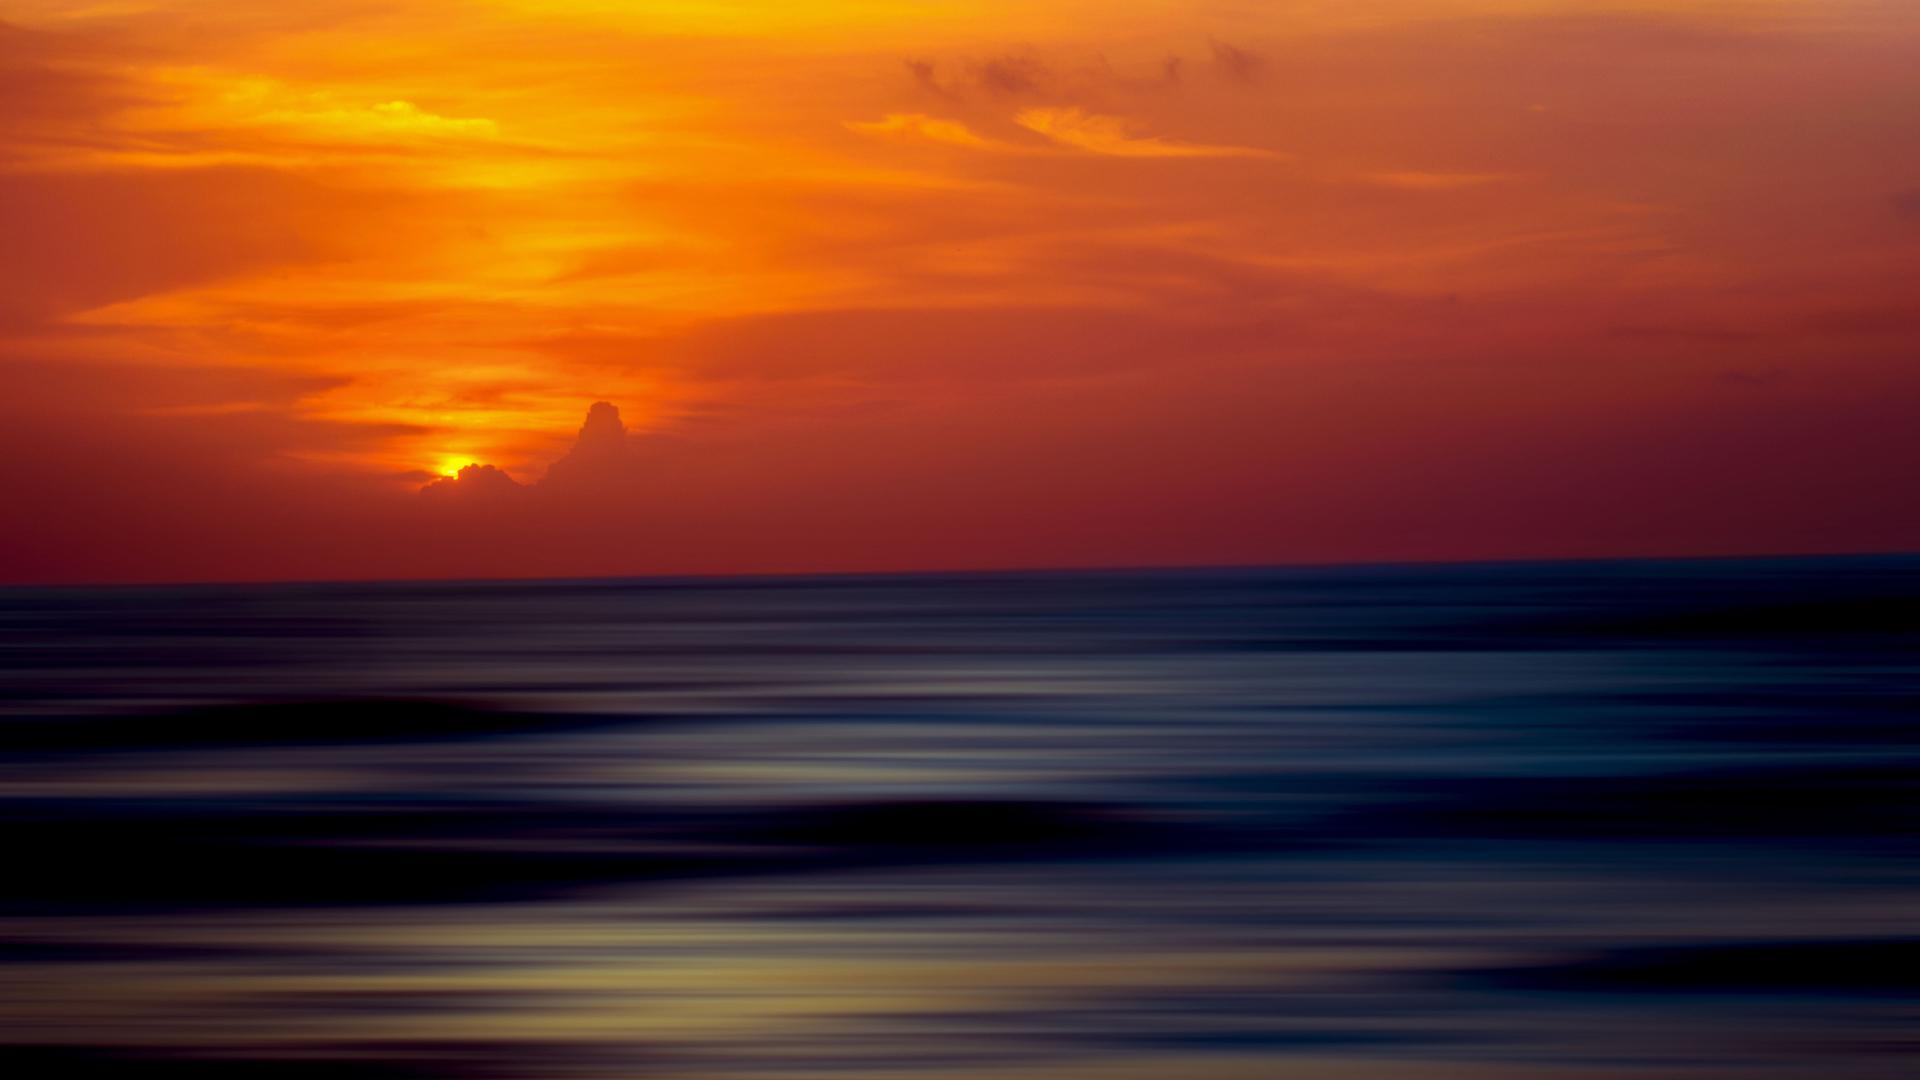 sunset ocean a2ZtZWiUmZqaraWkpJRmbmdlrWZlbWU